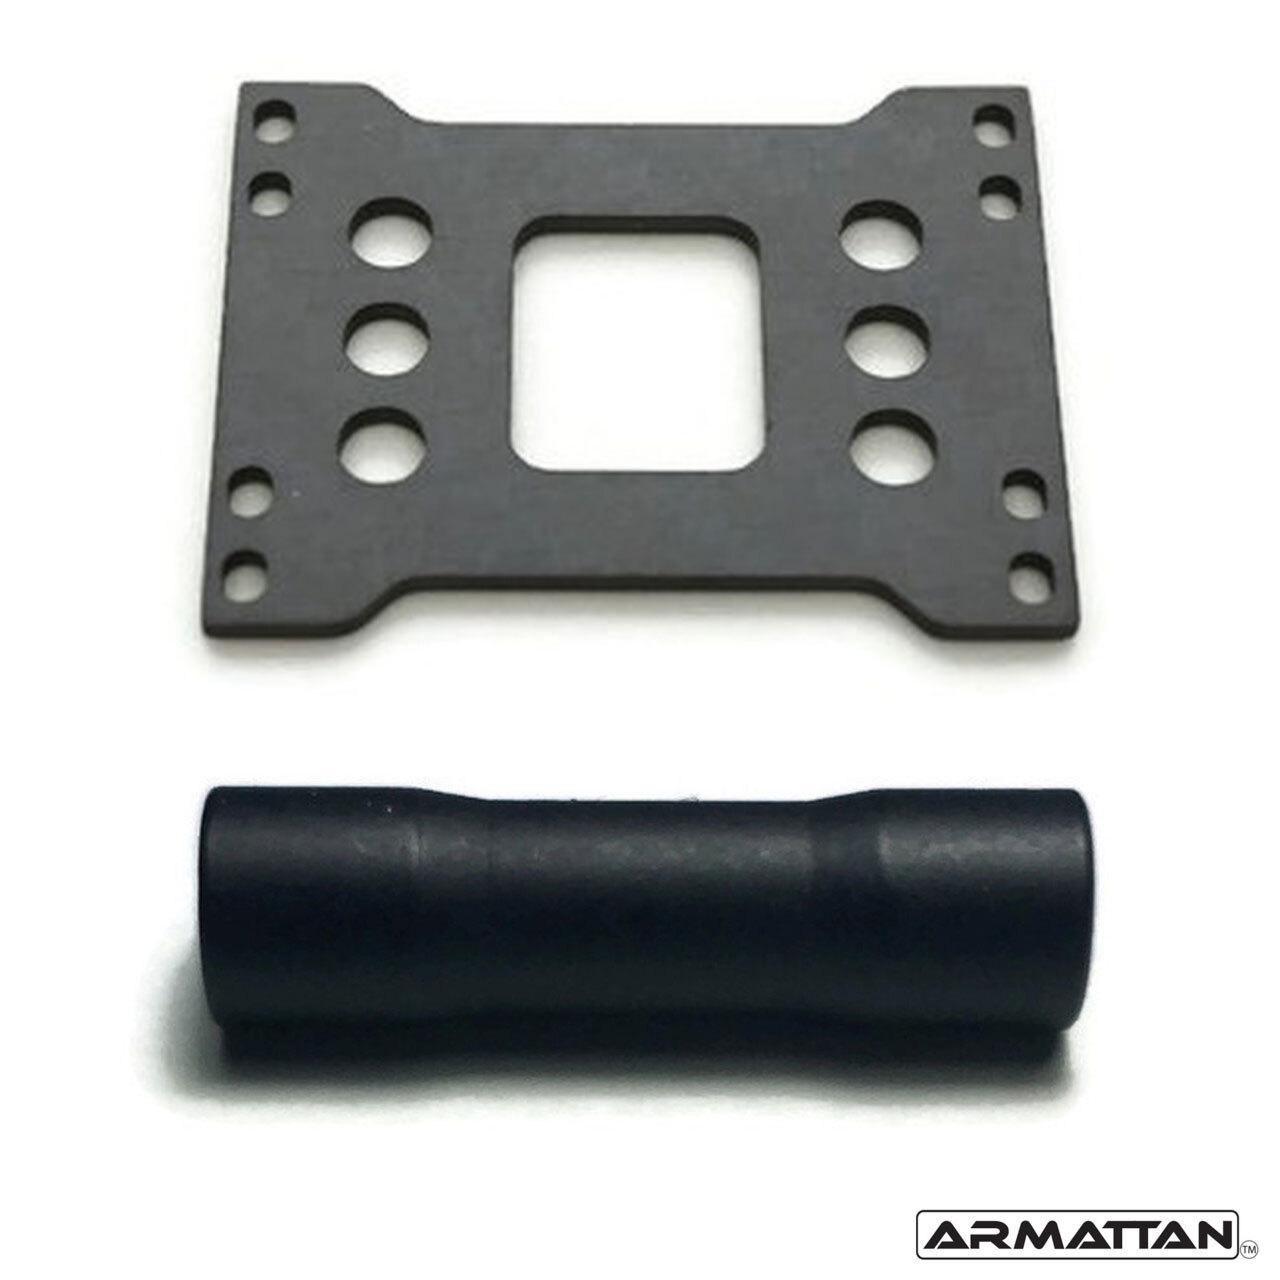 Armattan Chameleon HD Cam Top Plate & Standoff セット